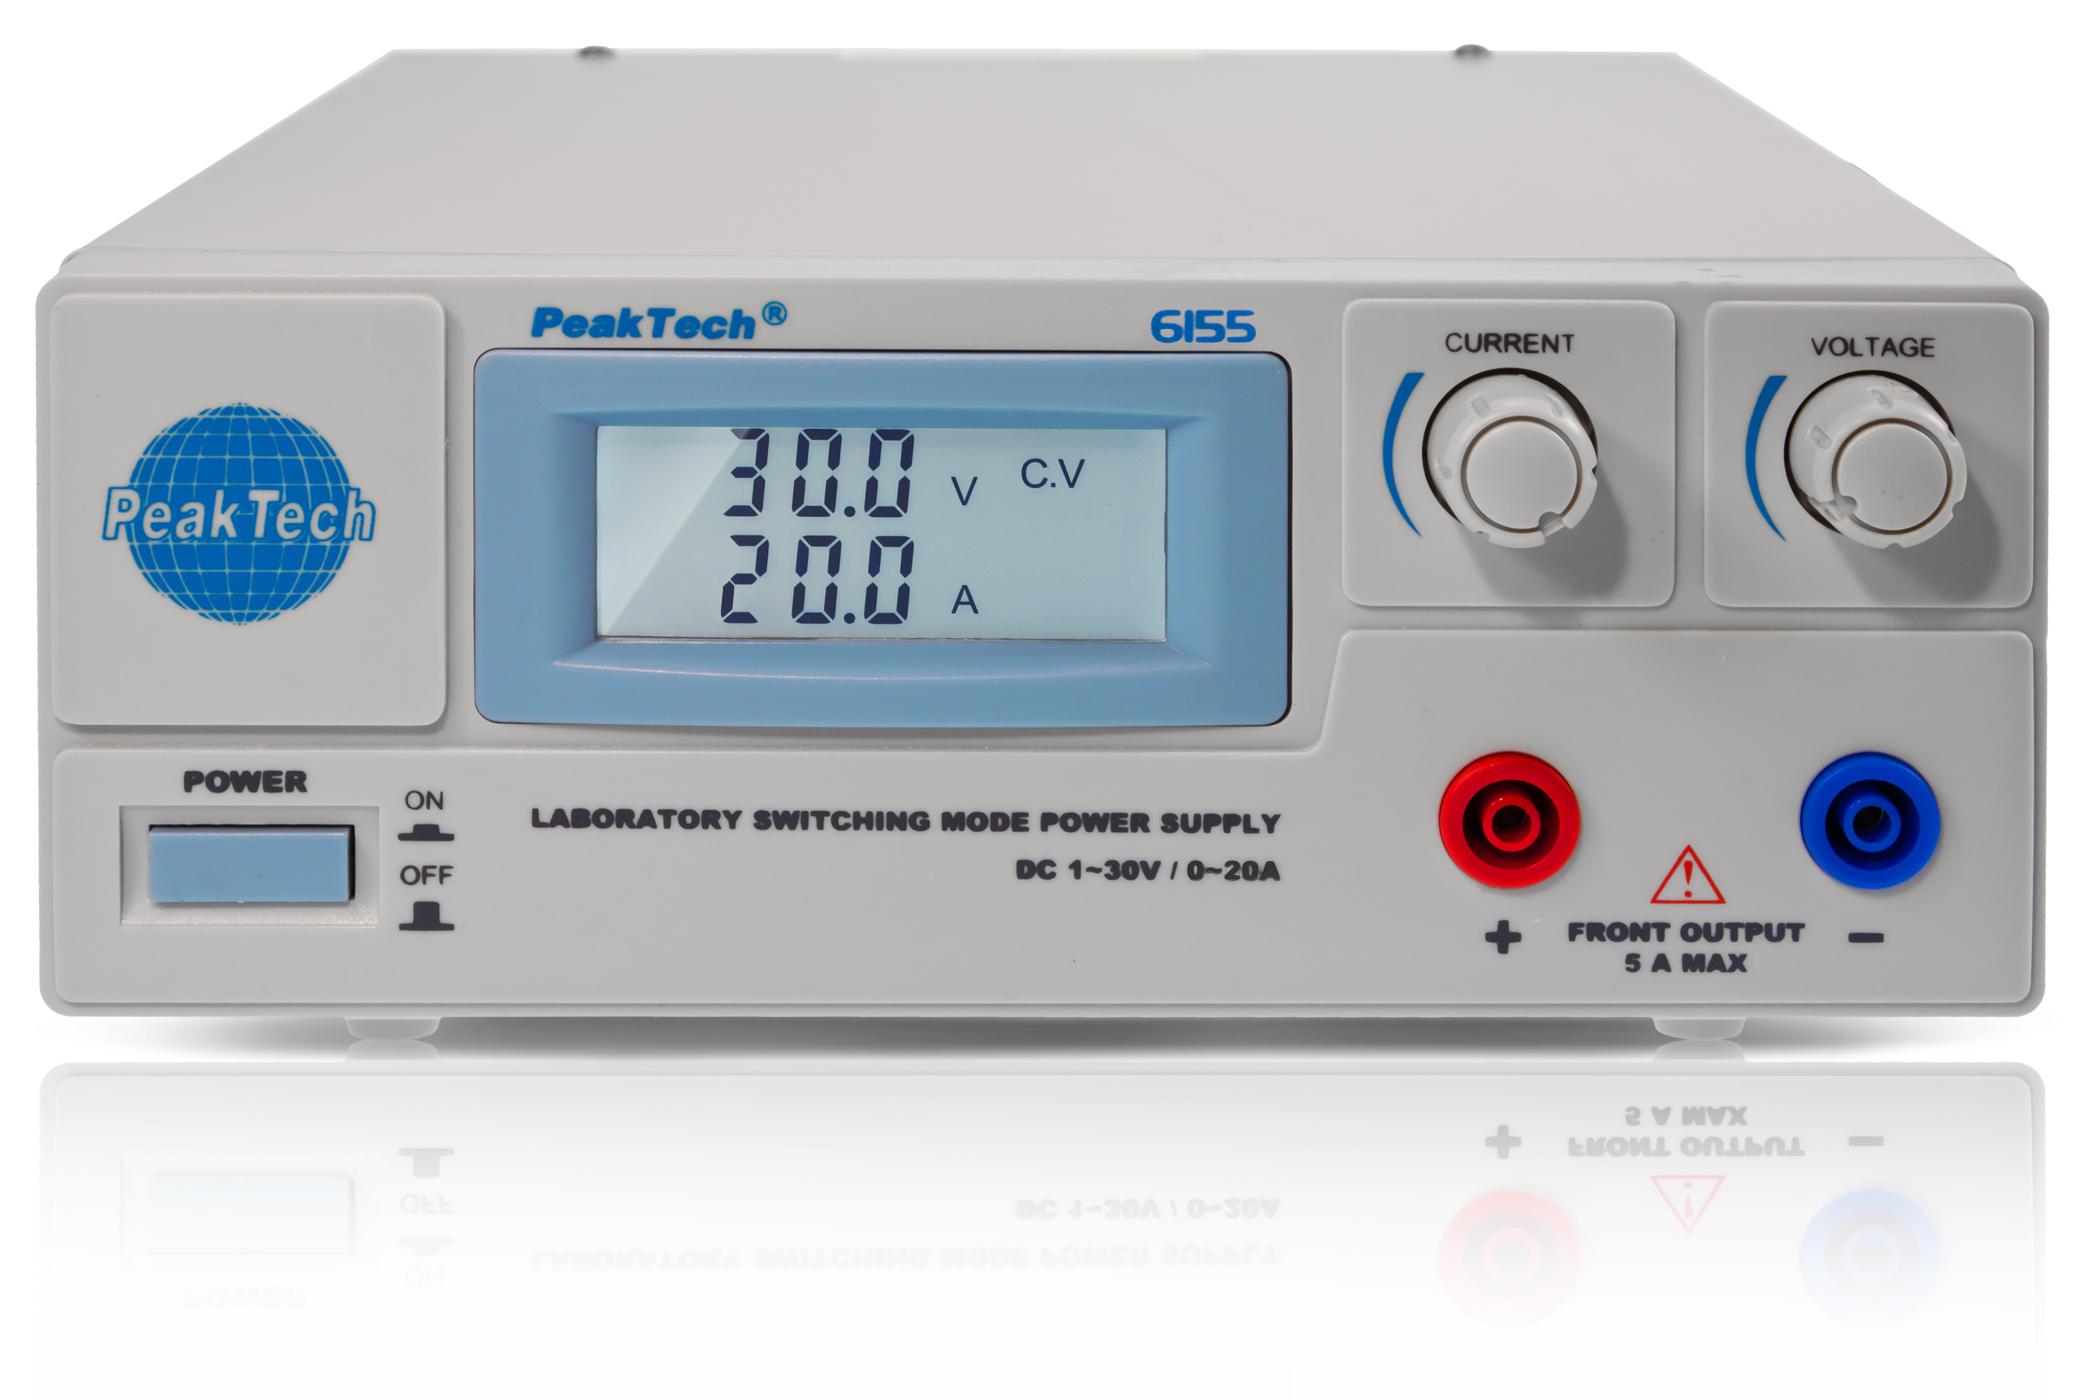 «PeakTech® P 6155» Laboratory Switching Mode Power Supply